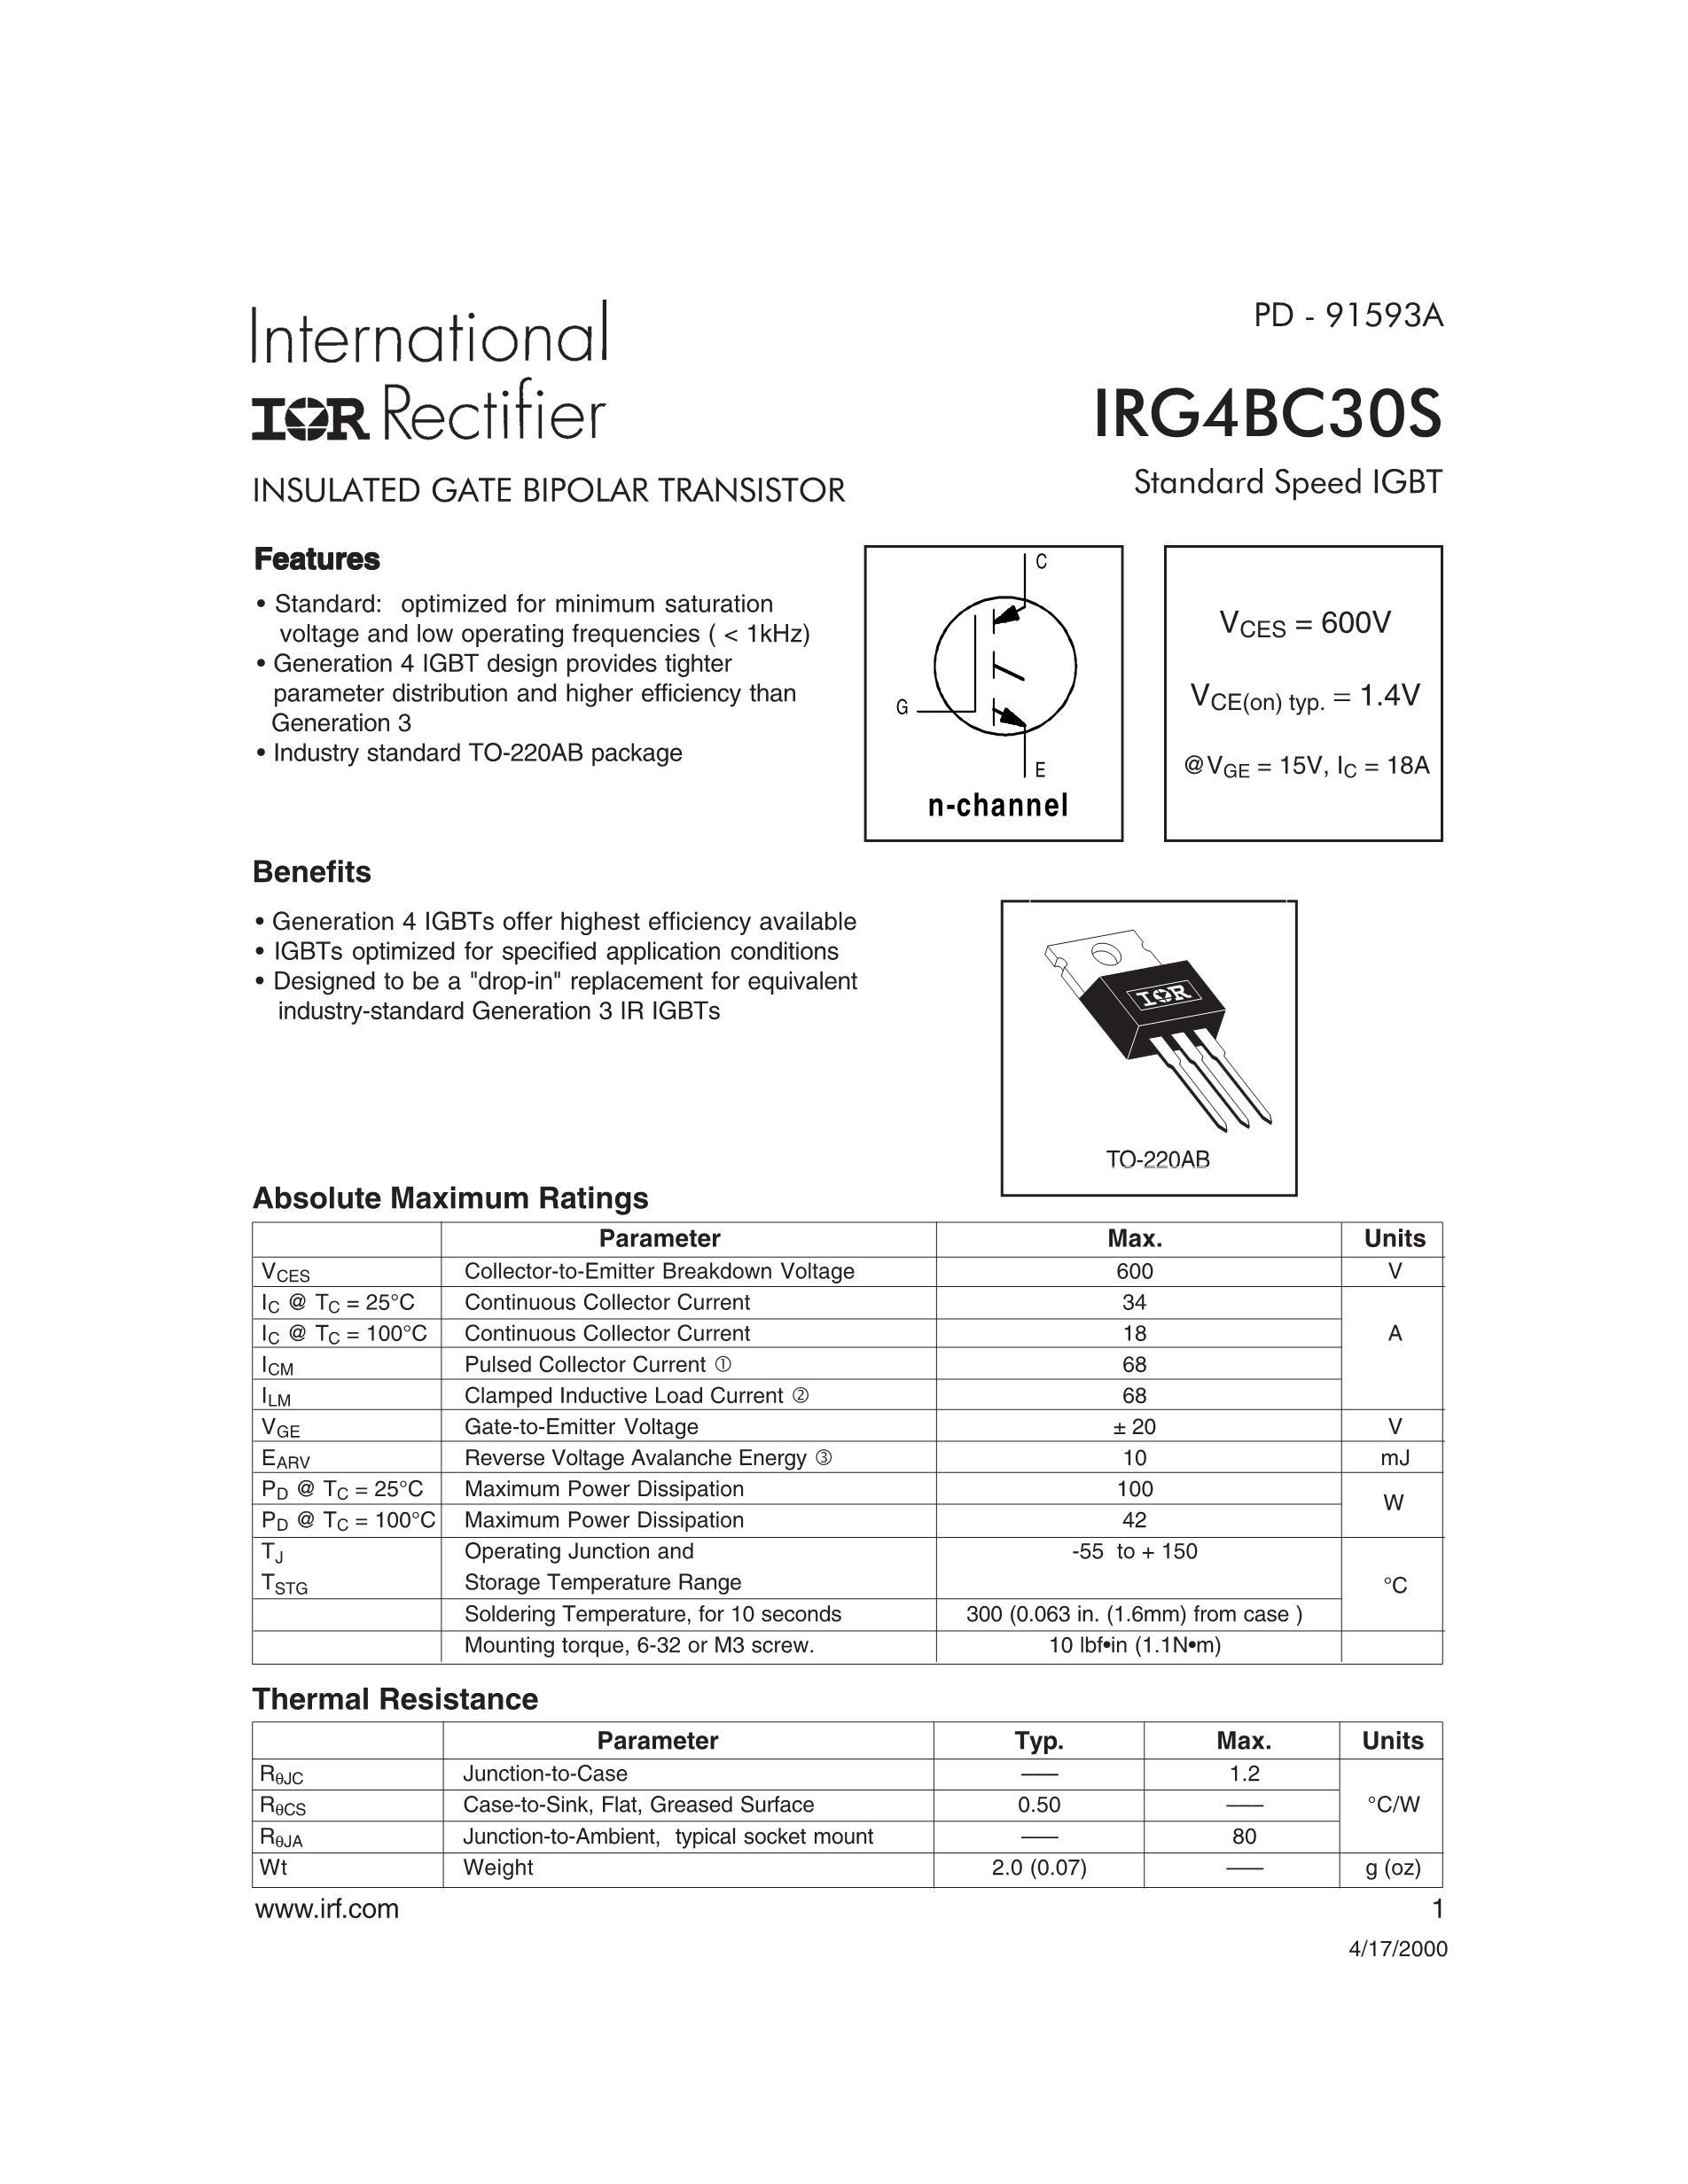 IRG4BC30KDPBF,IRG4BC30KD,G4BC30KD's pdf picture 1